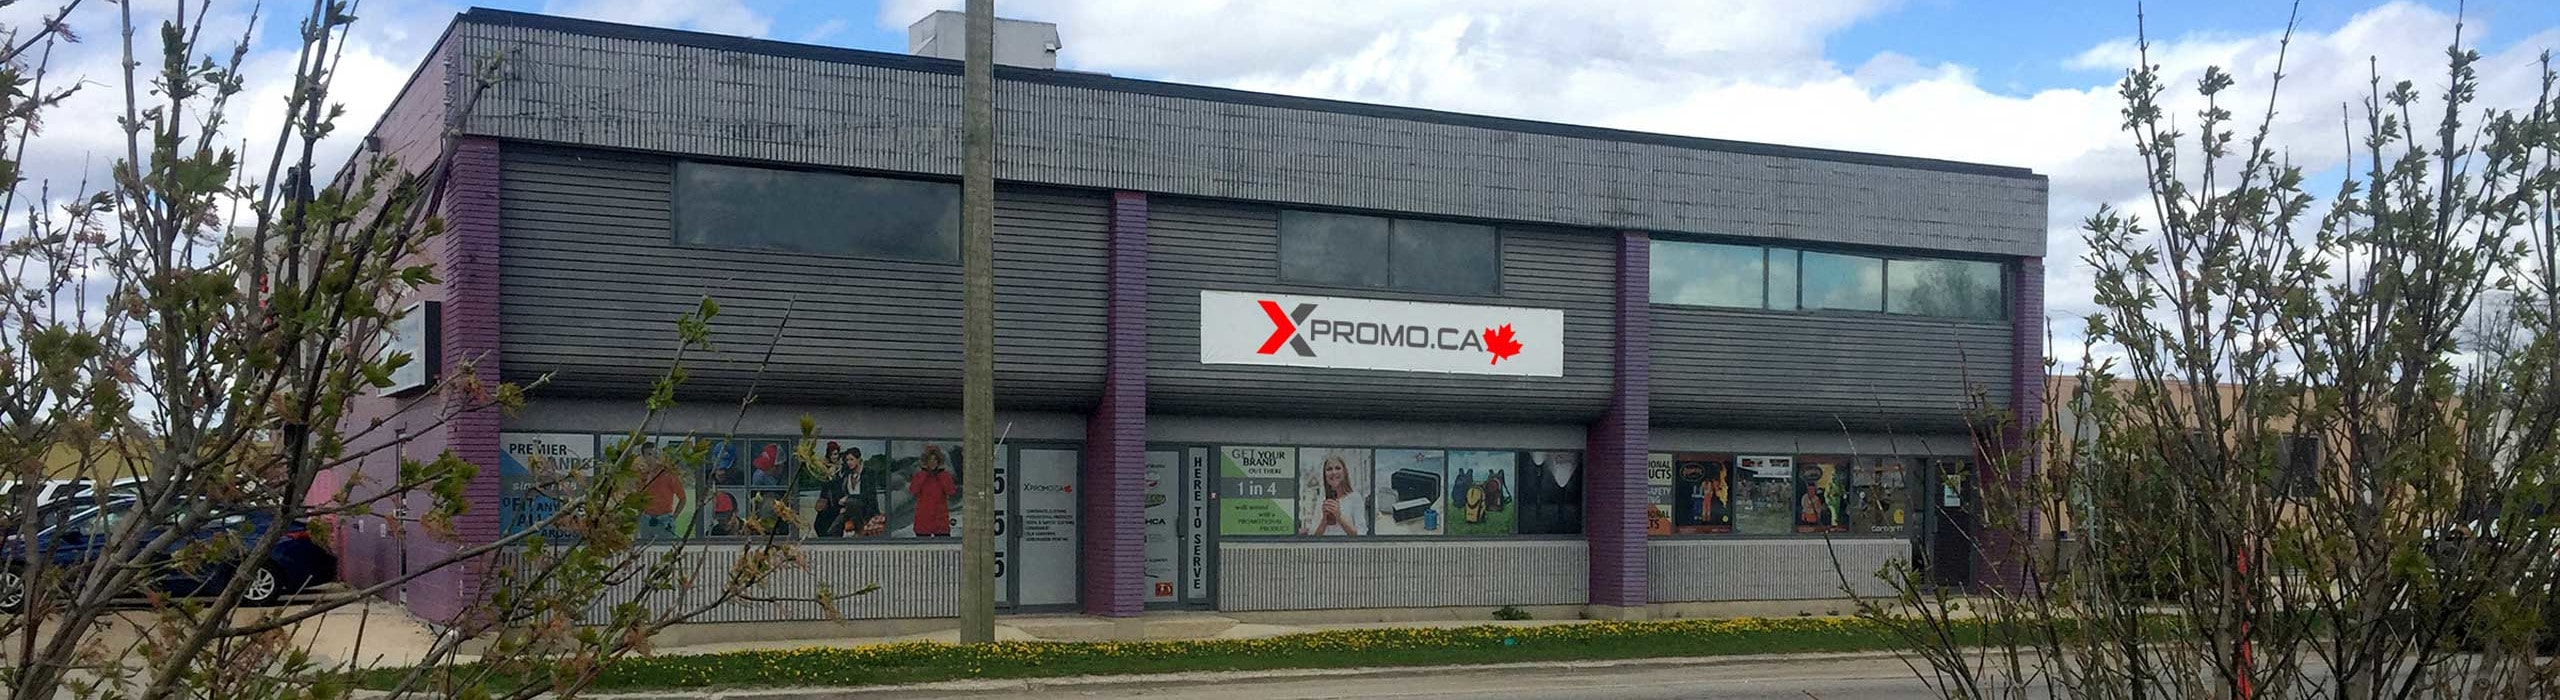 Xpromo.ca Winnipeg Office